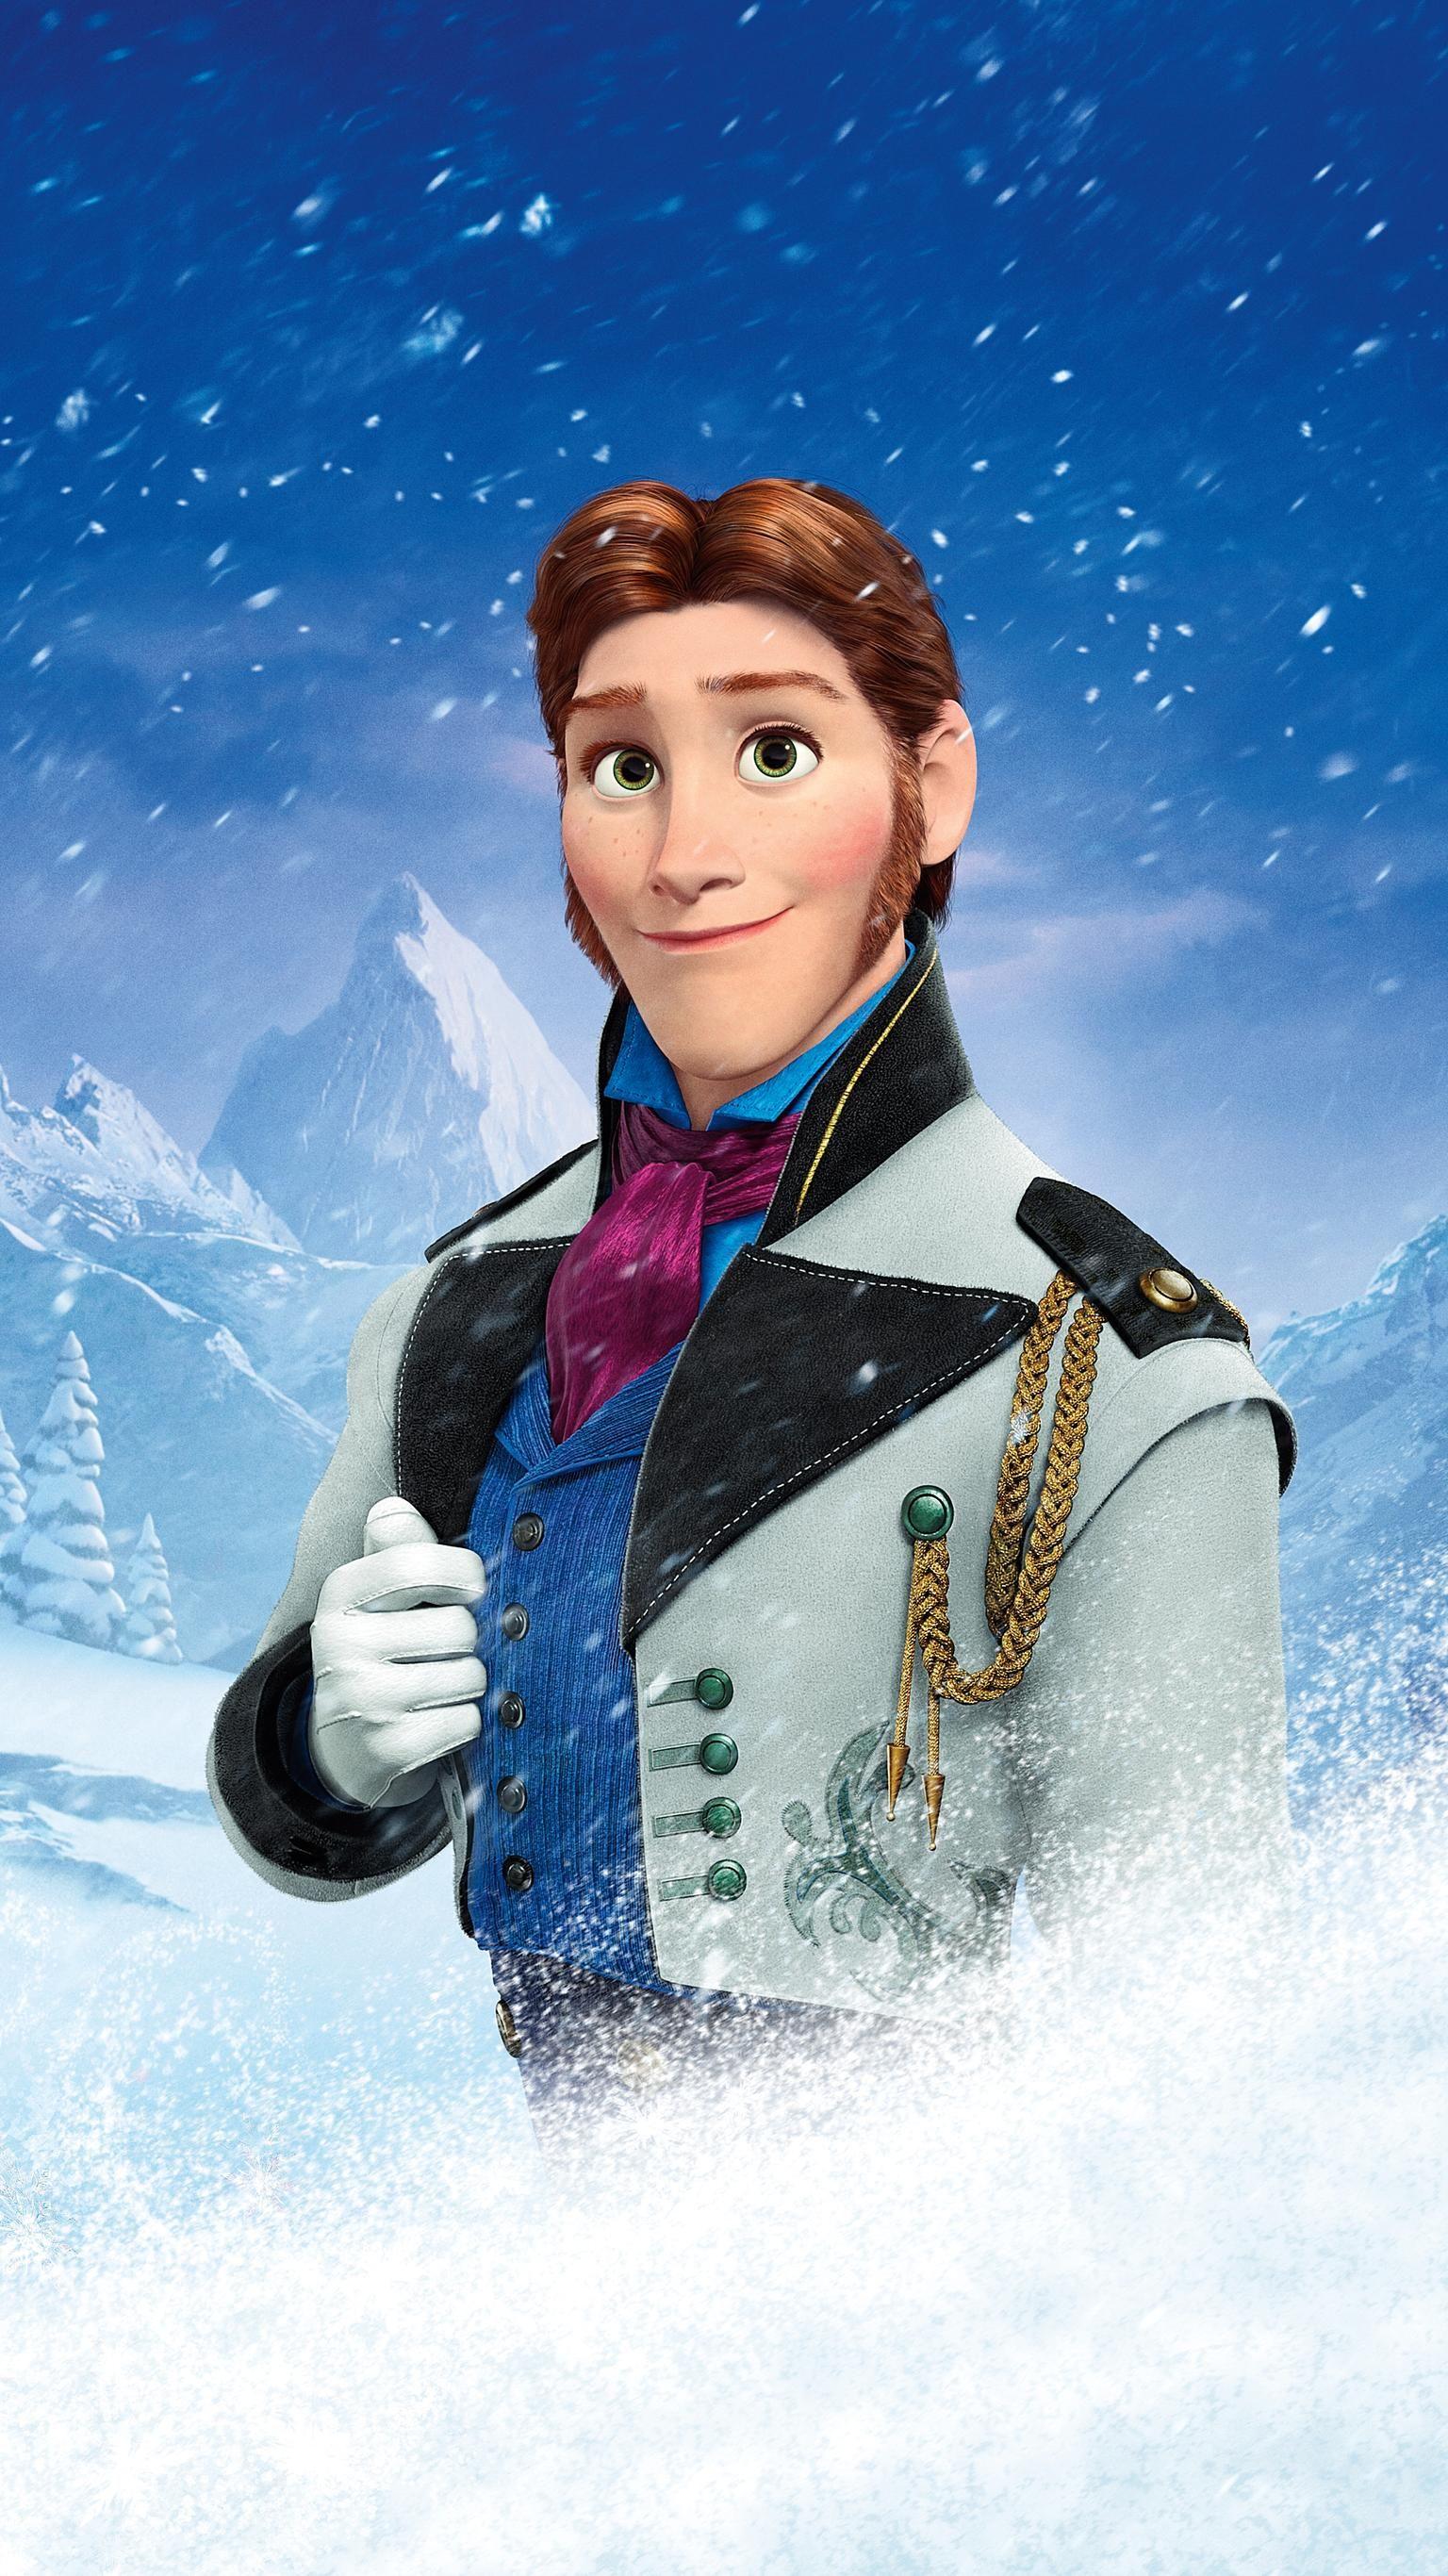 Frozen (2013) Phone Wallpaper | Moviemania